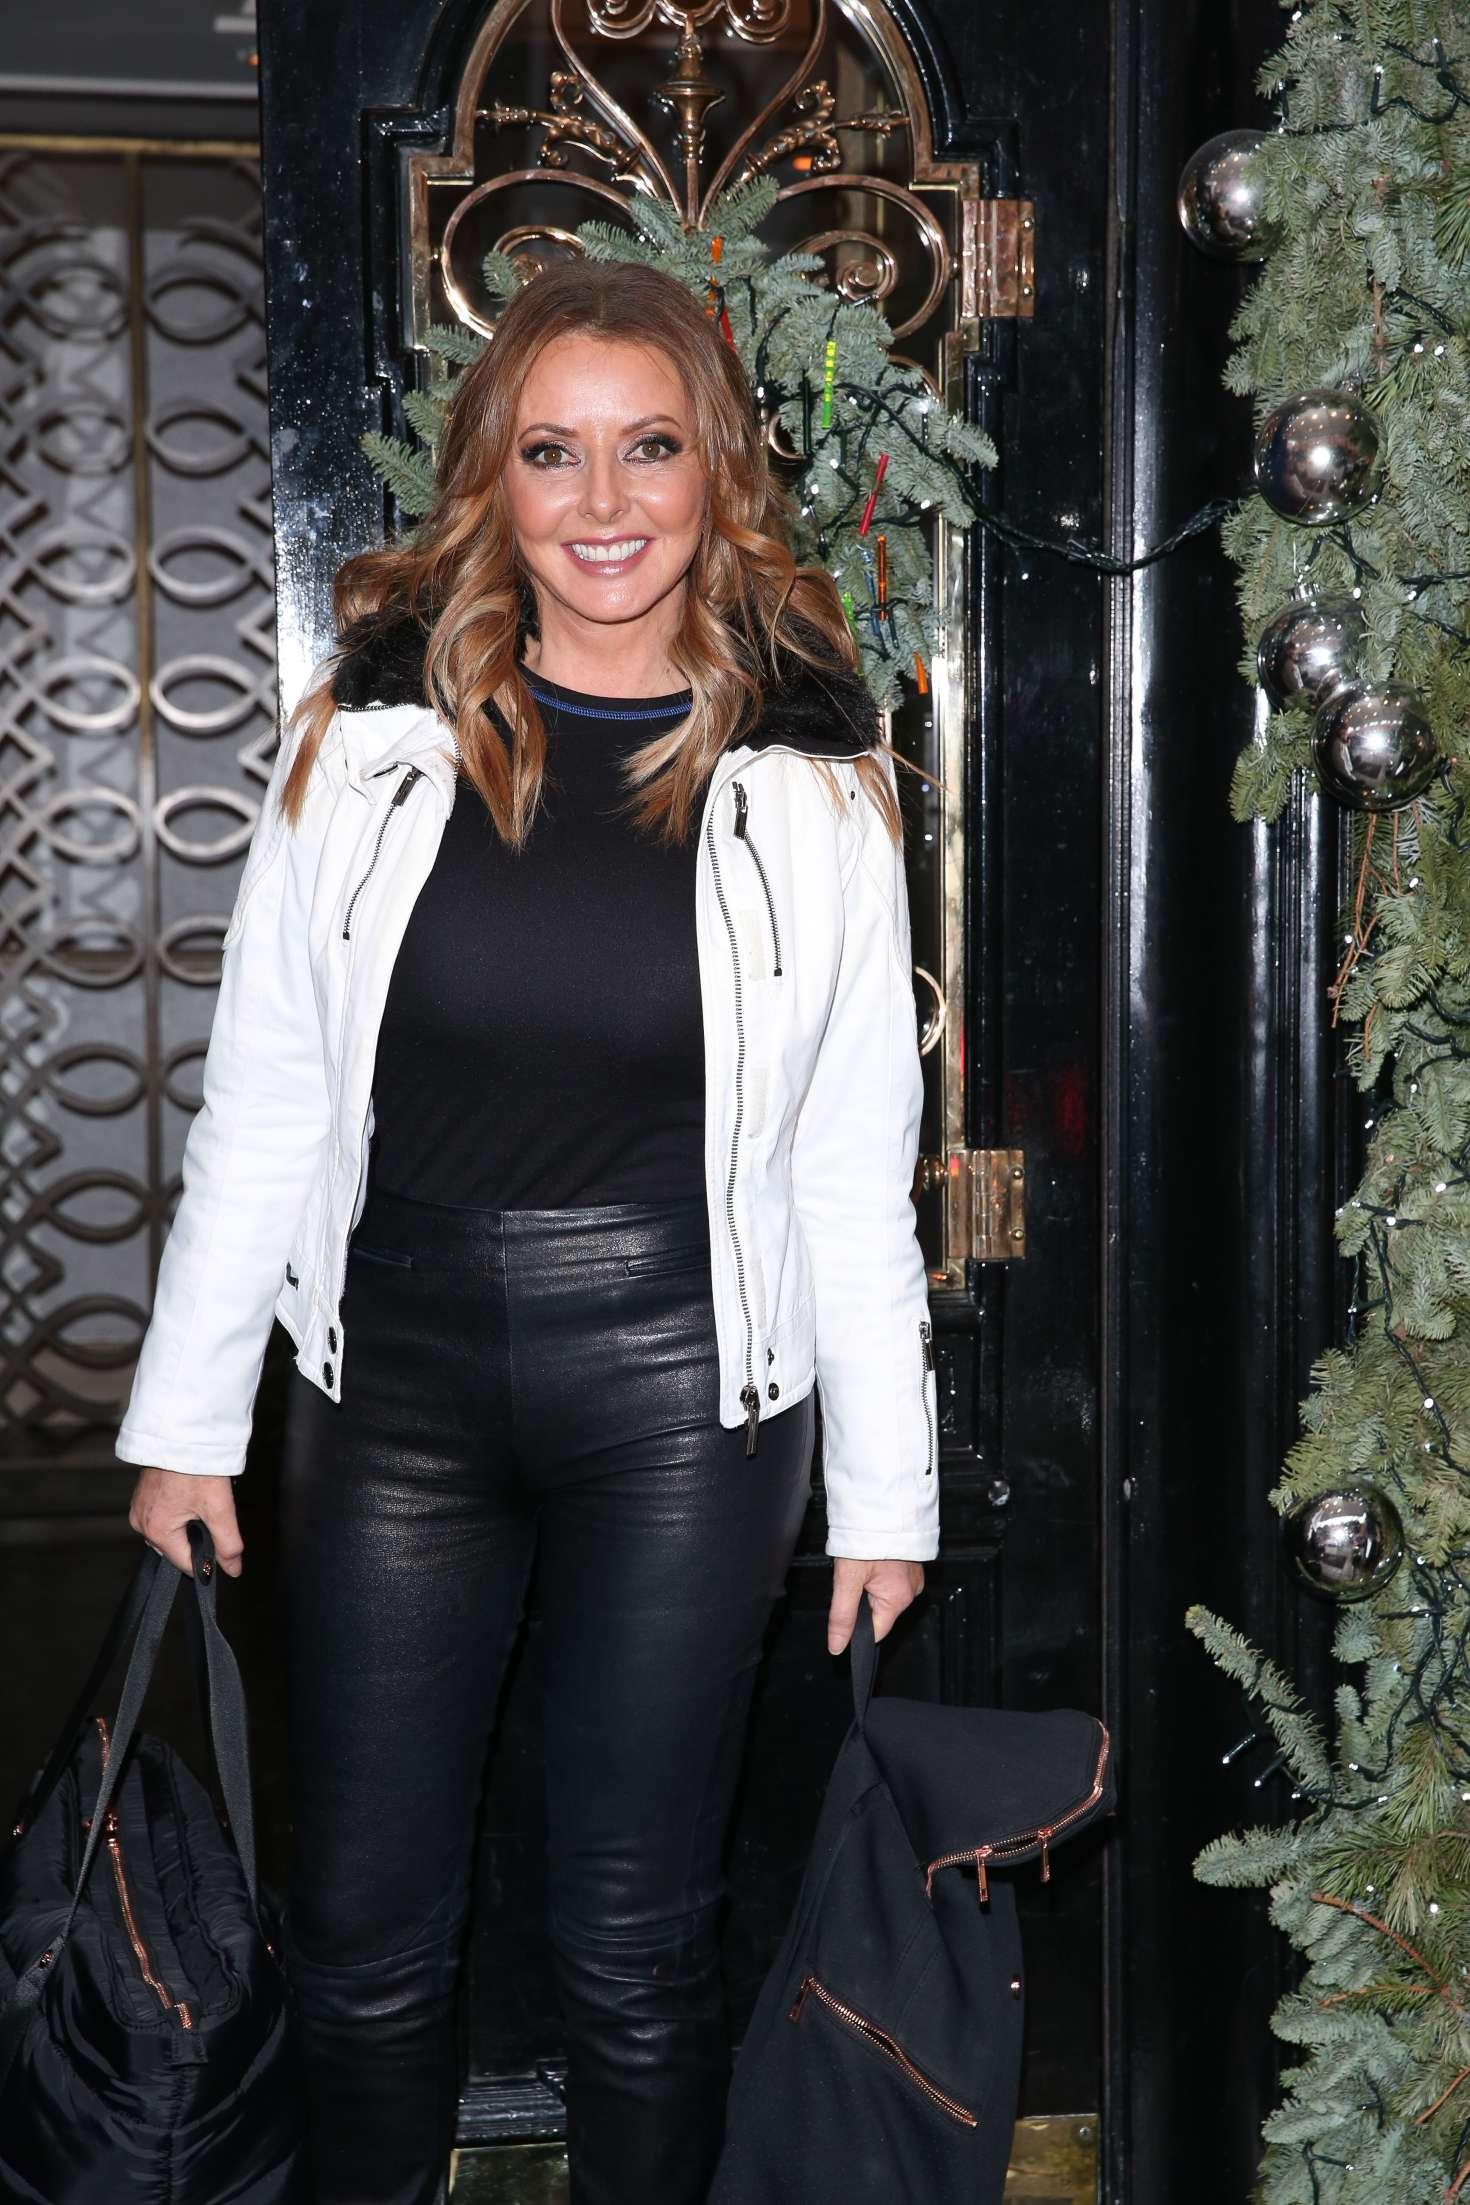 Carol Vorderman in Leather Pants at Scotts Restaurant in London